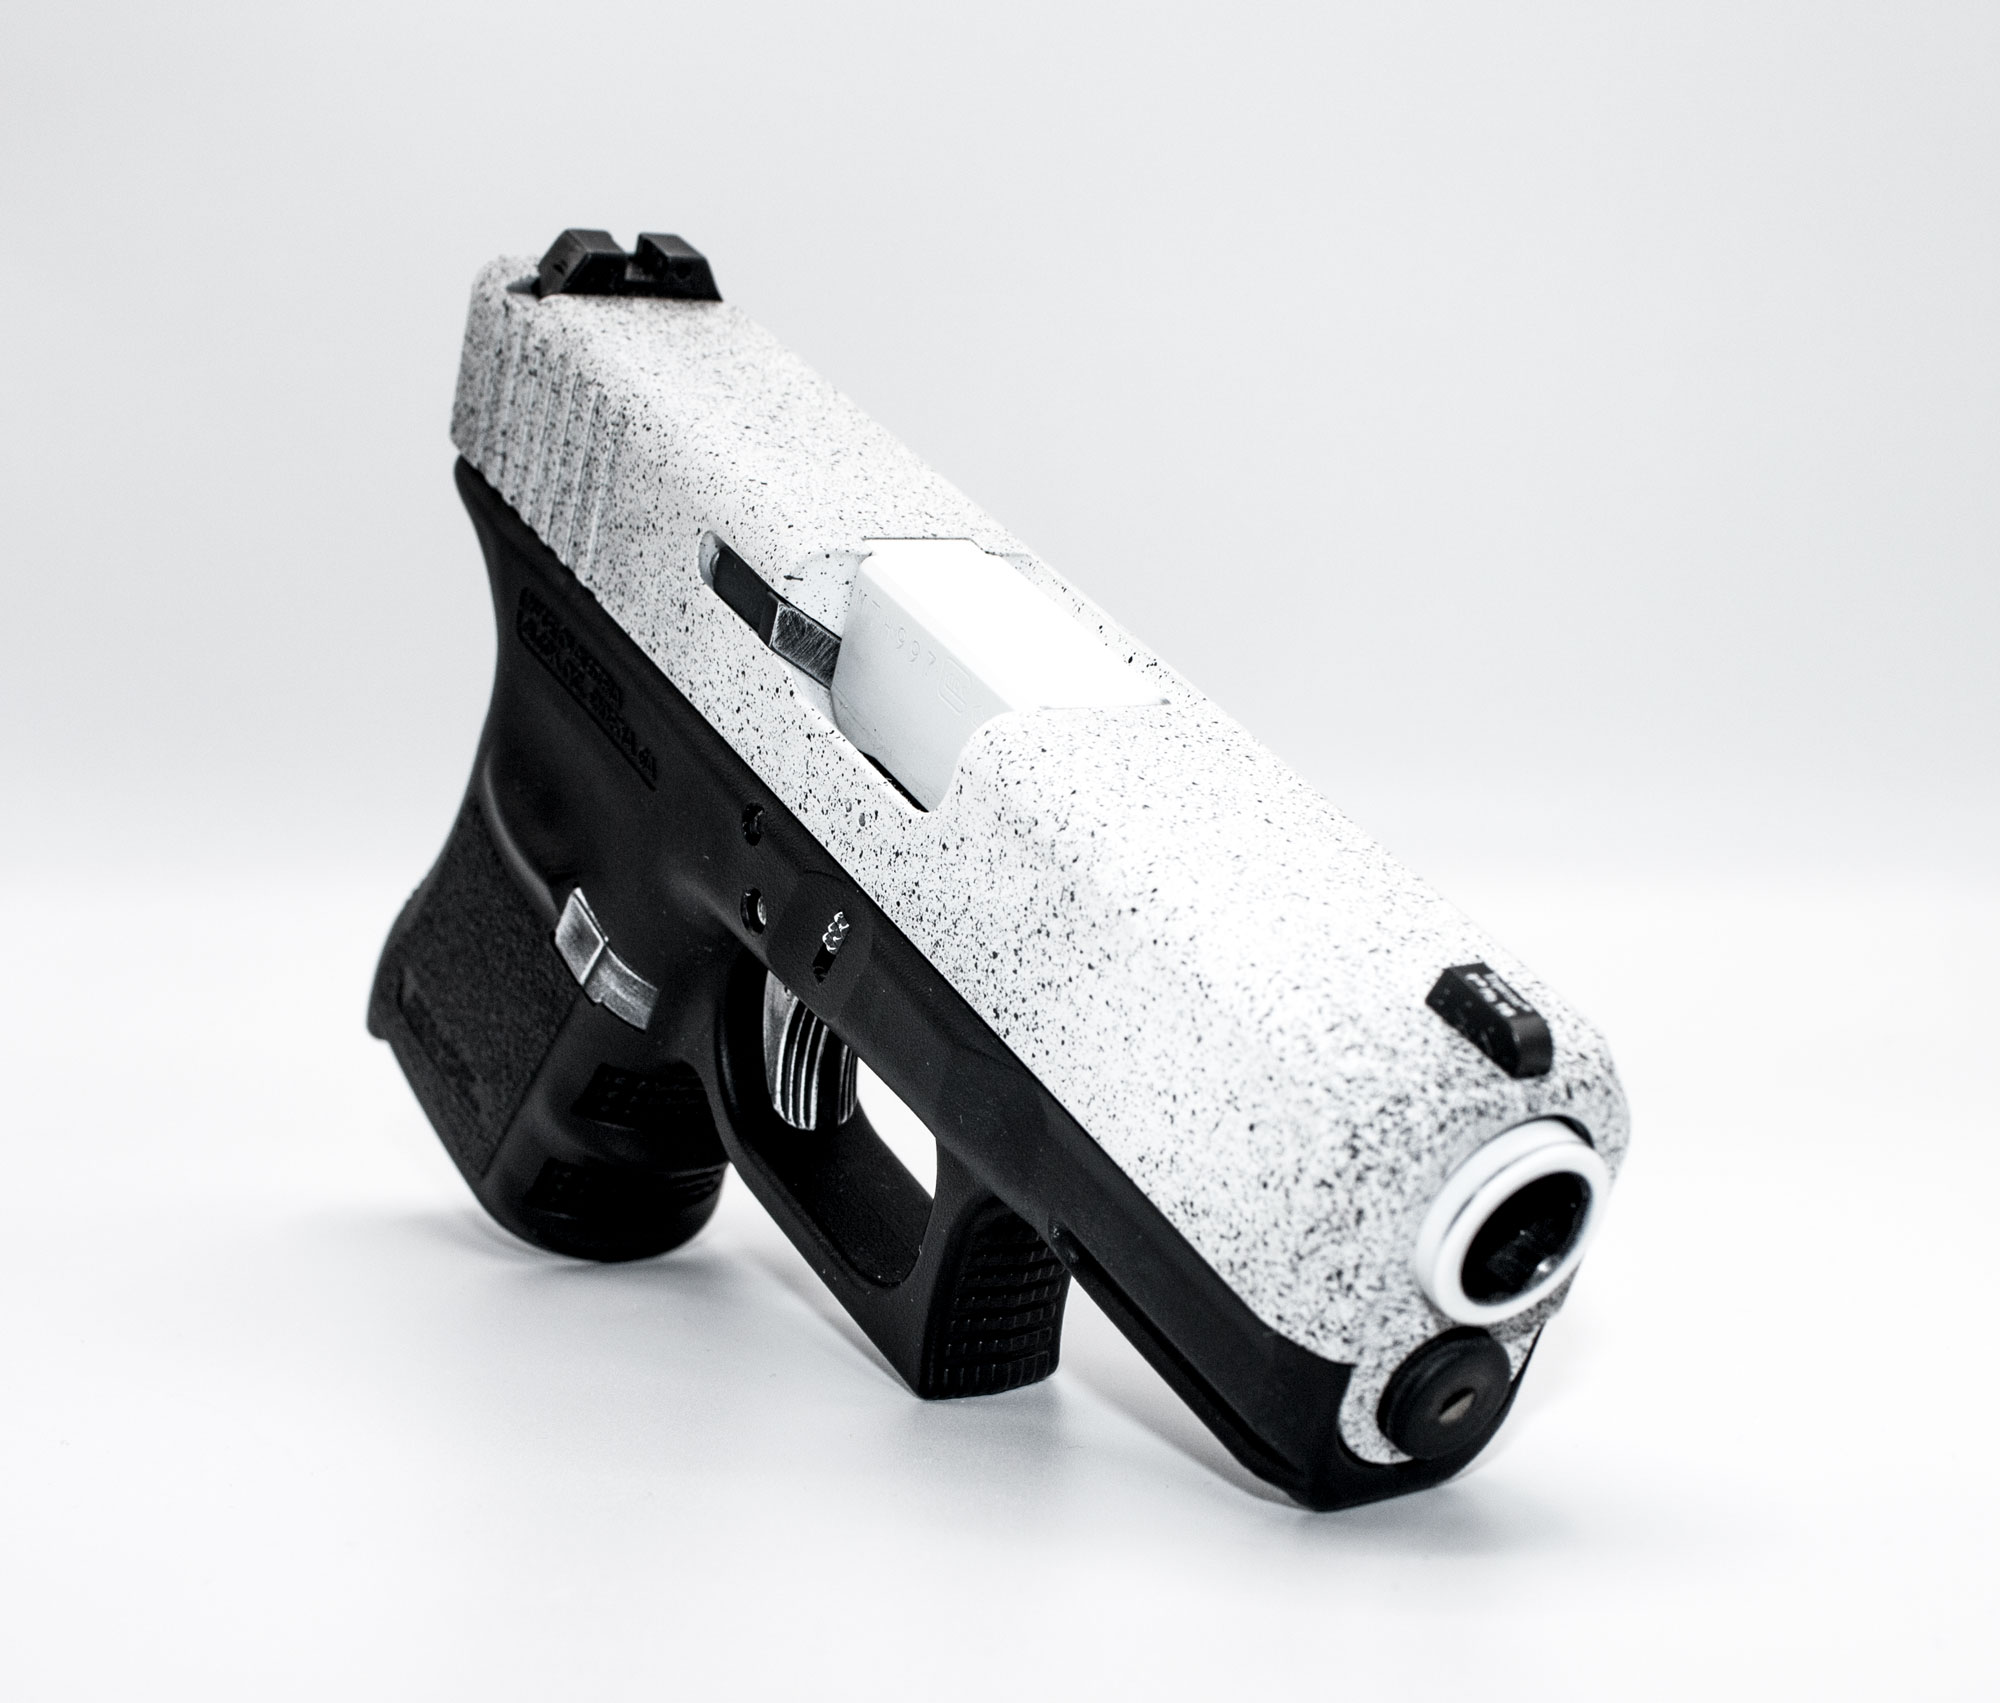 Alan-Lloyd-Glock-Static-Front-MEDIUM.jpg